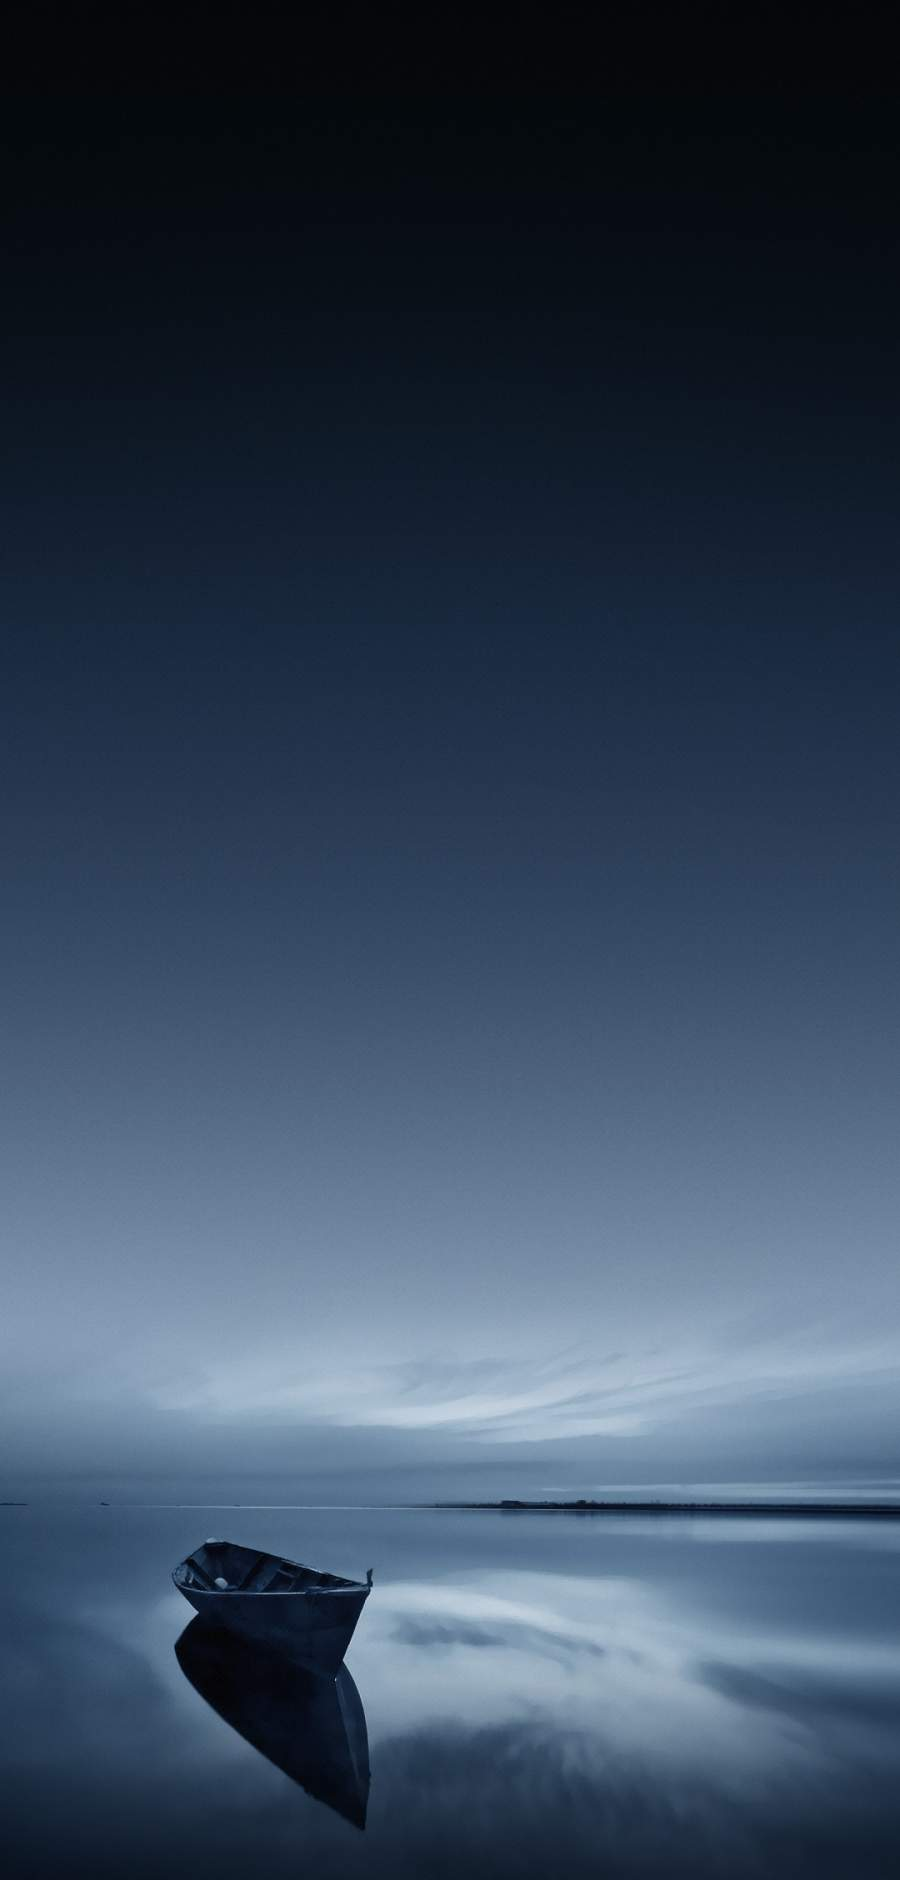 Calm Ocean iPhone Wallpaper